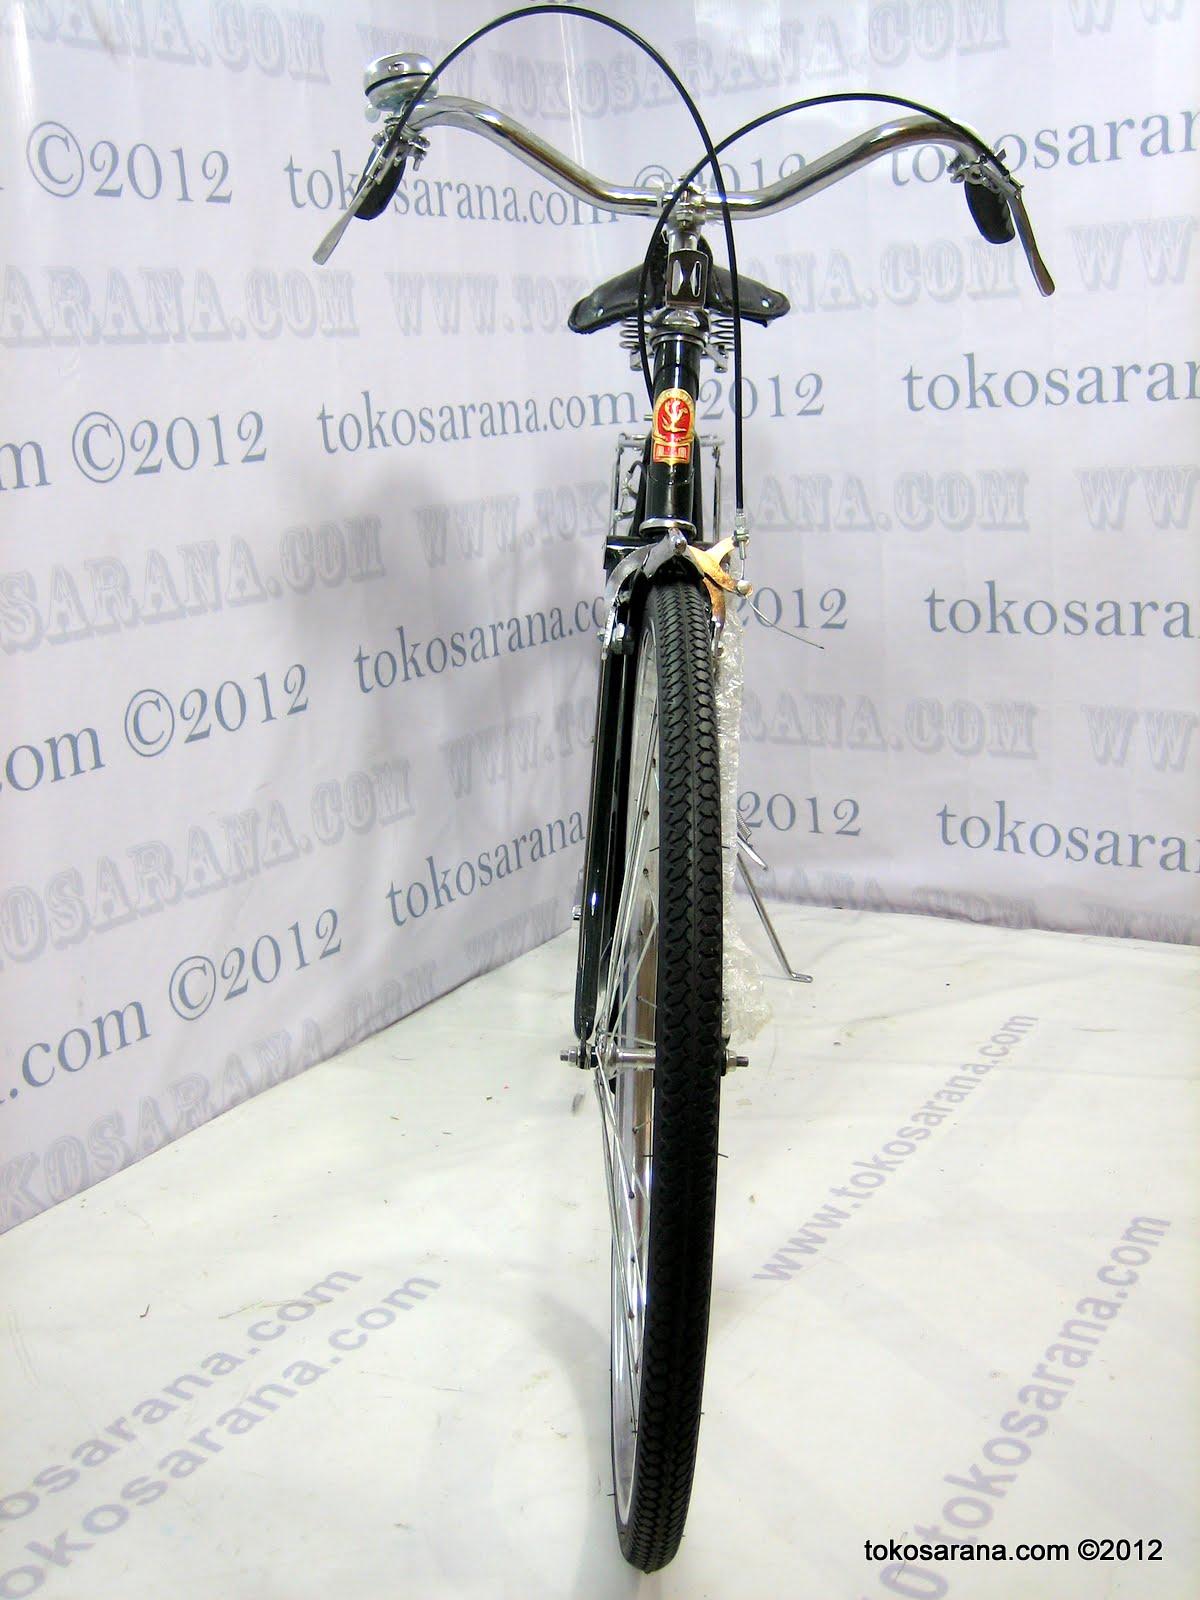 Tokosarana Mahasarana Sukses Heavy Duty Bike Phoenix Spl65 Light Roadster For Ladies 26 Inci